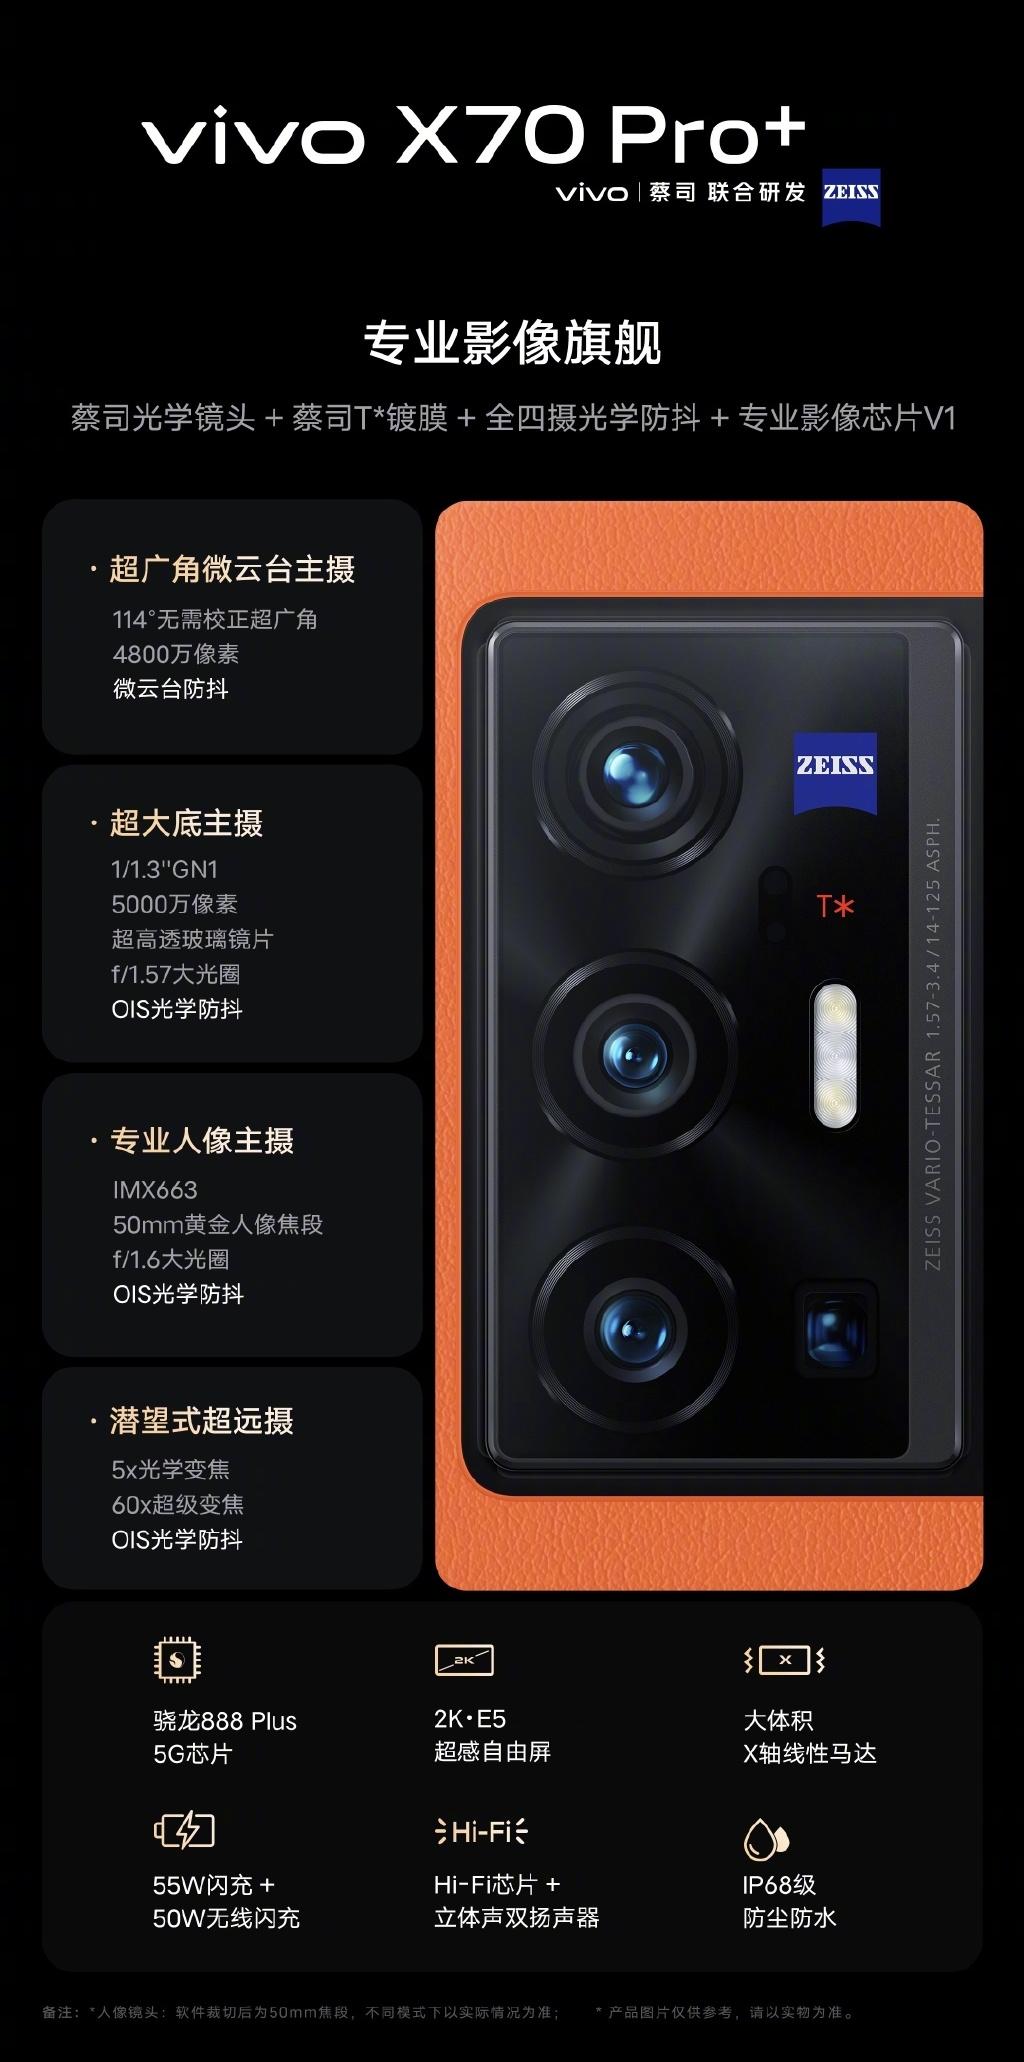 Особенности камер смартфонов серии Vivo X70